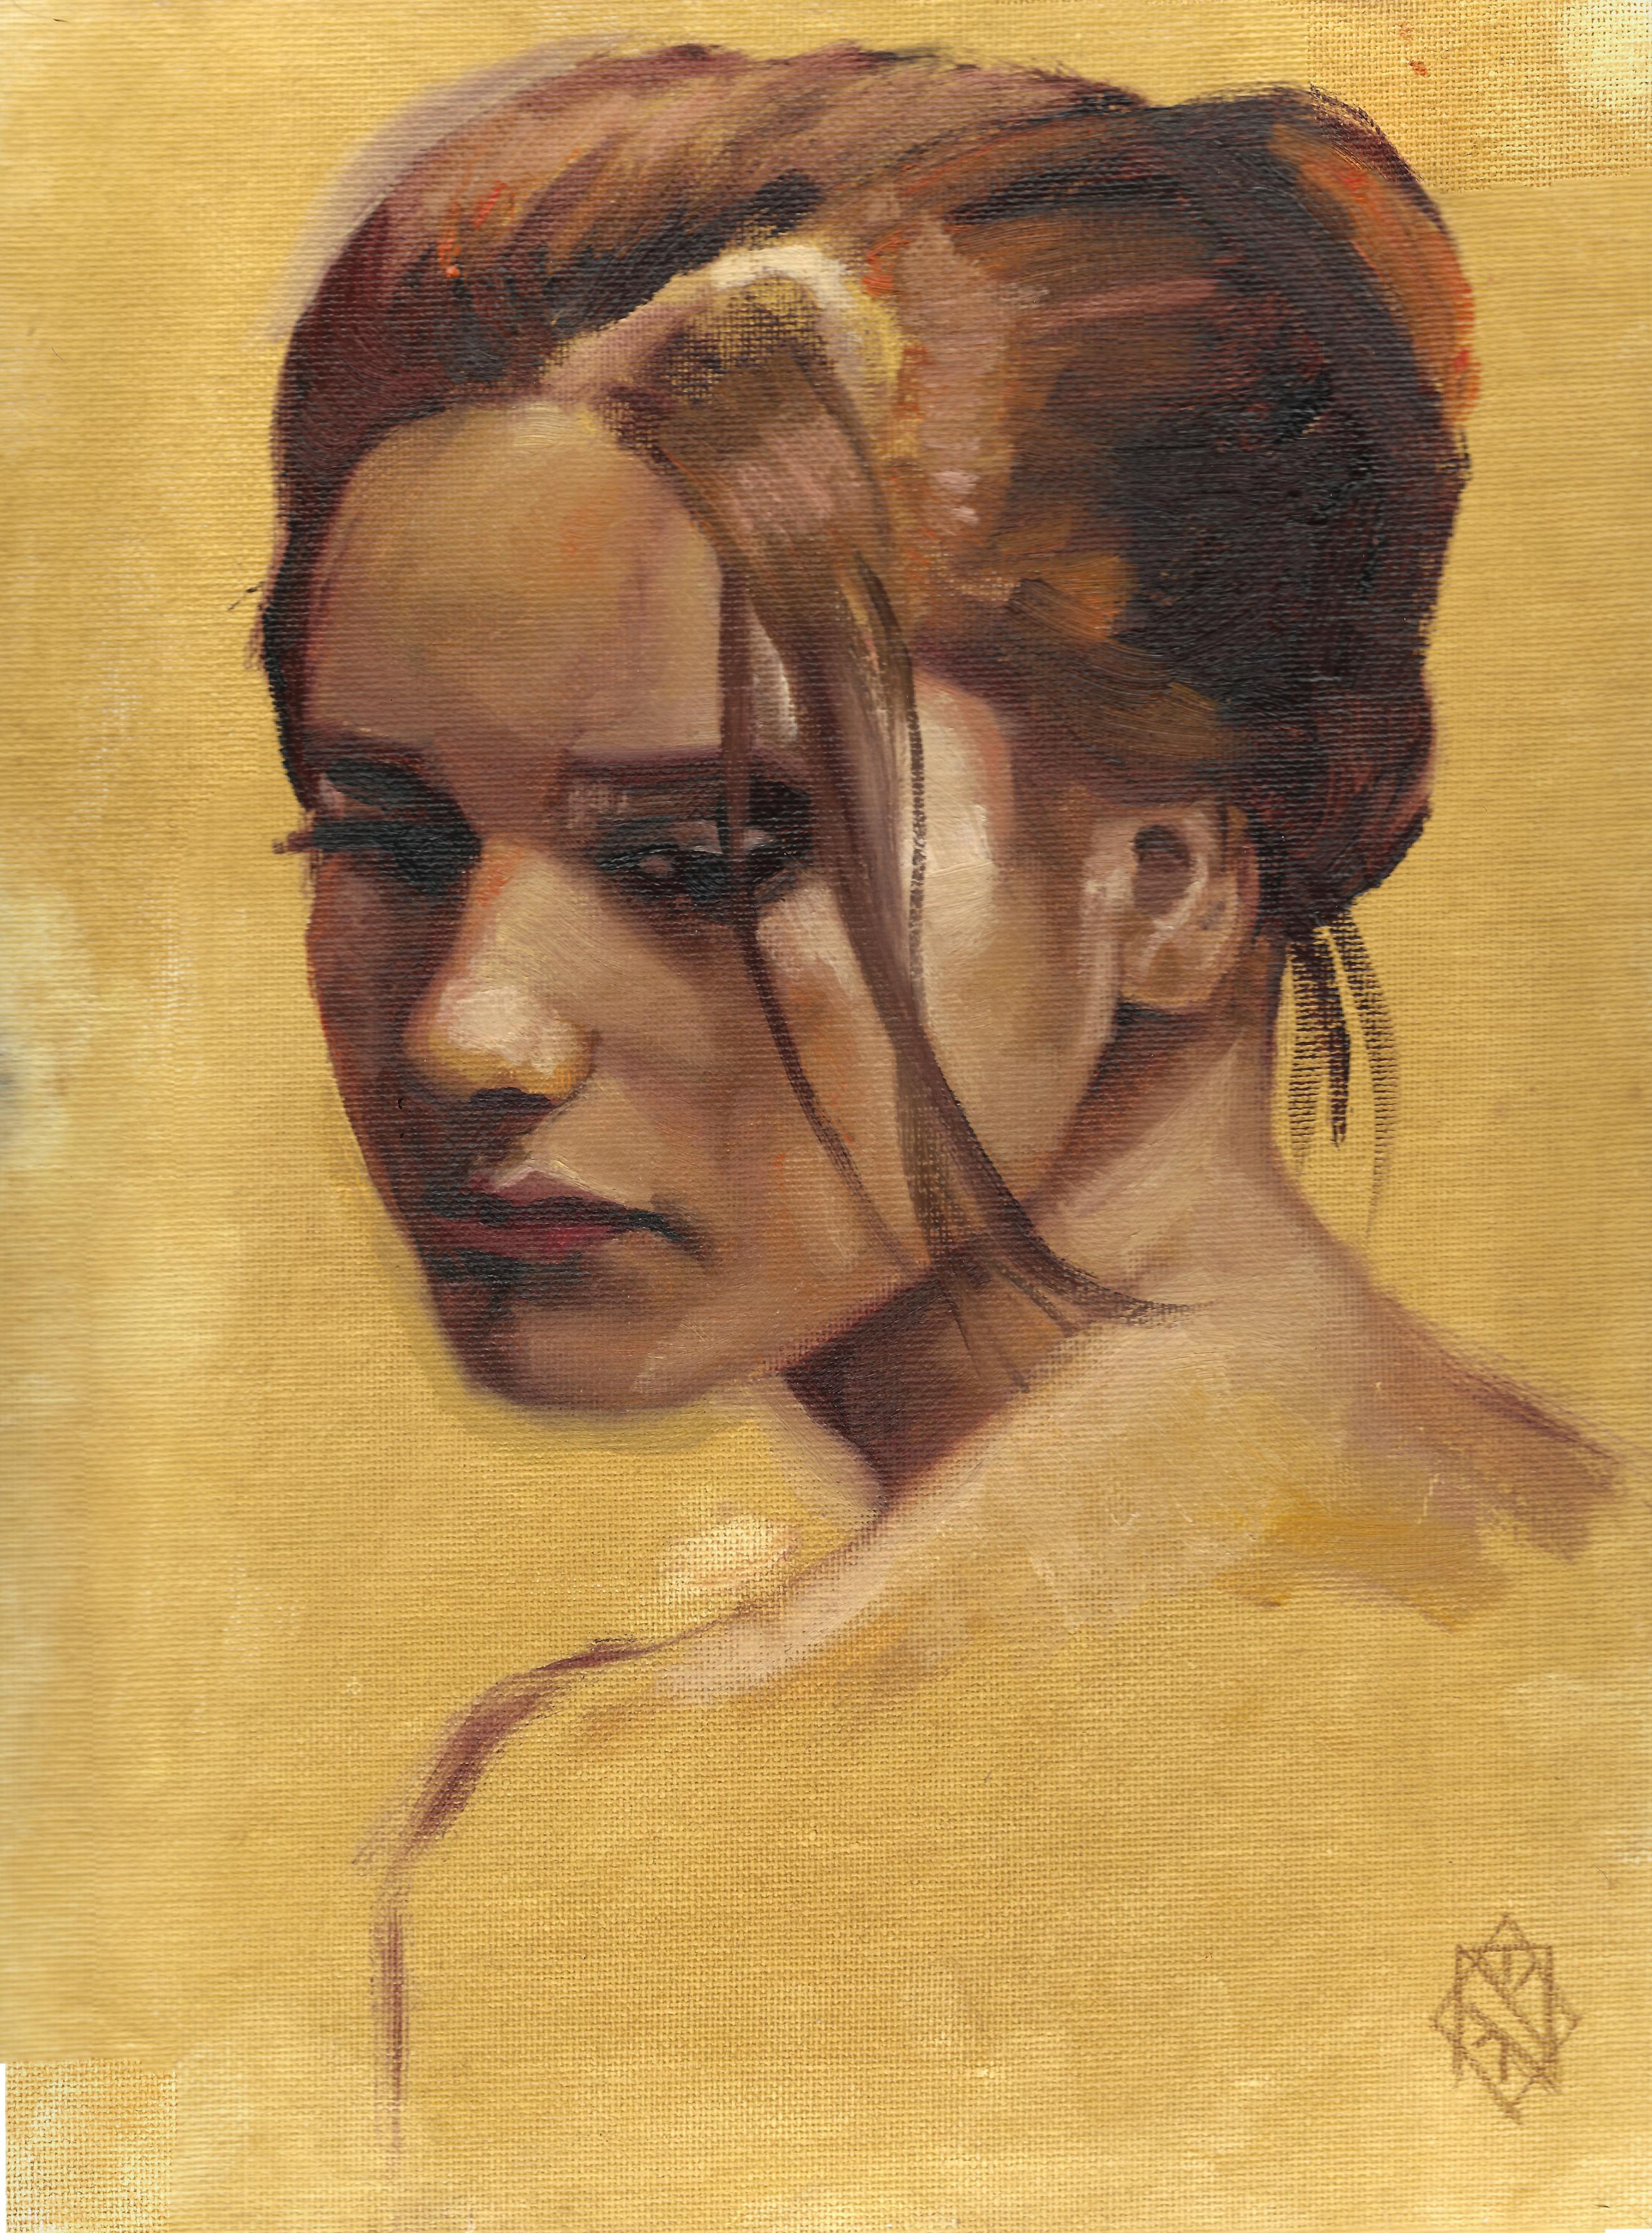 soft redhead portrait